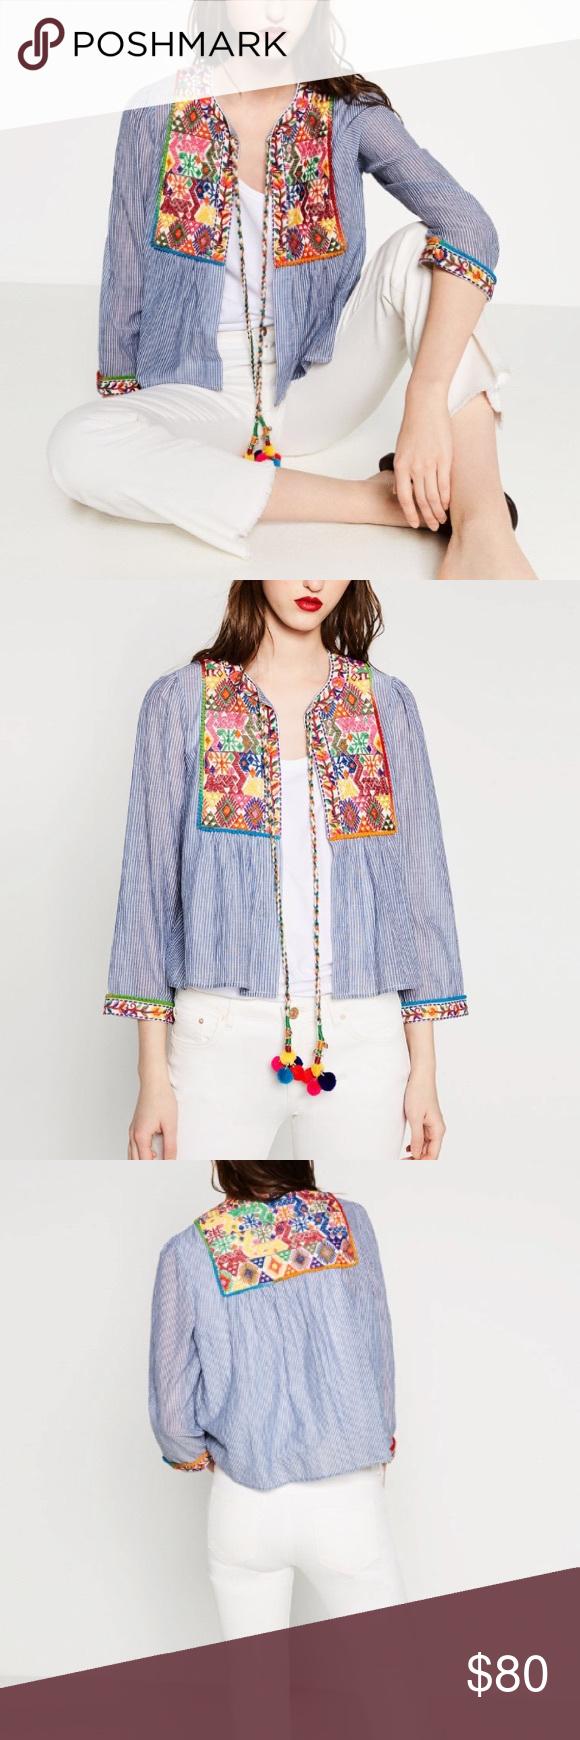 Zara Embroidered Jacket Gorgeous Detail Blue And White Cotton